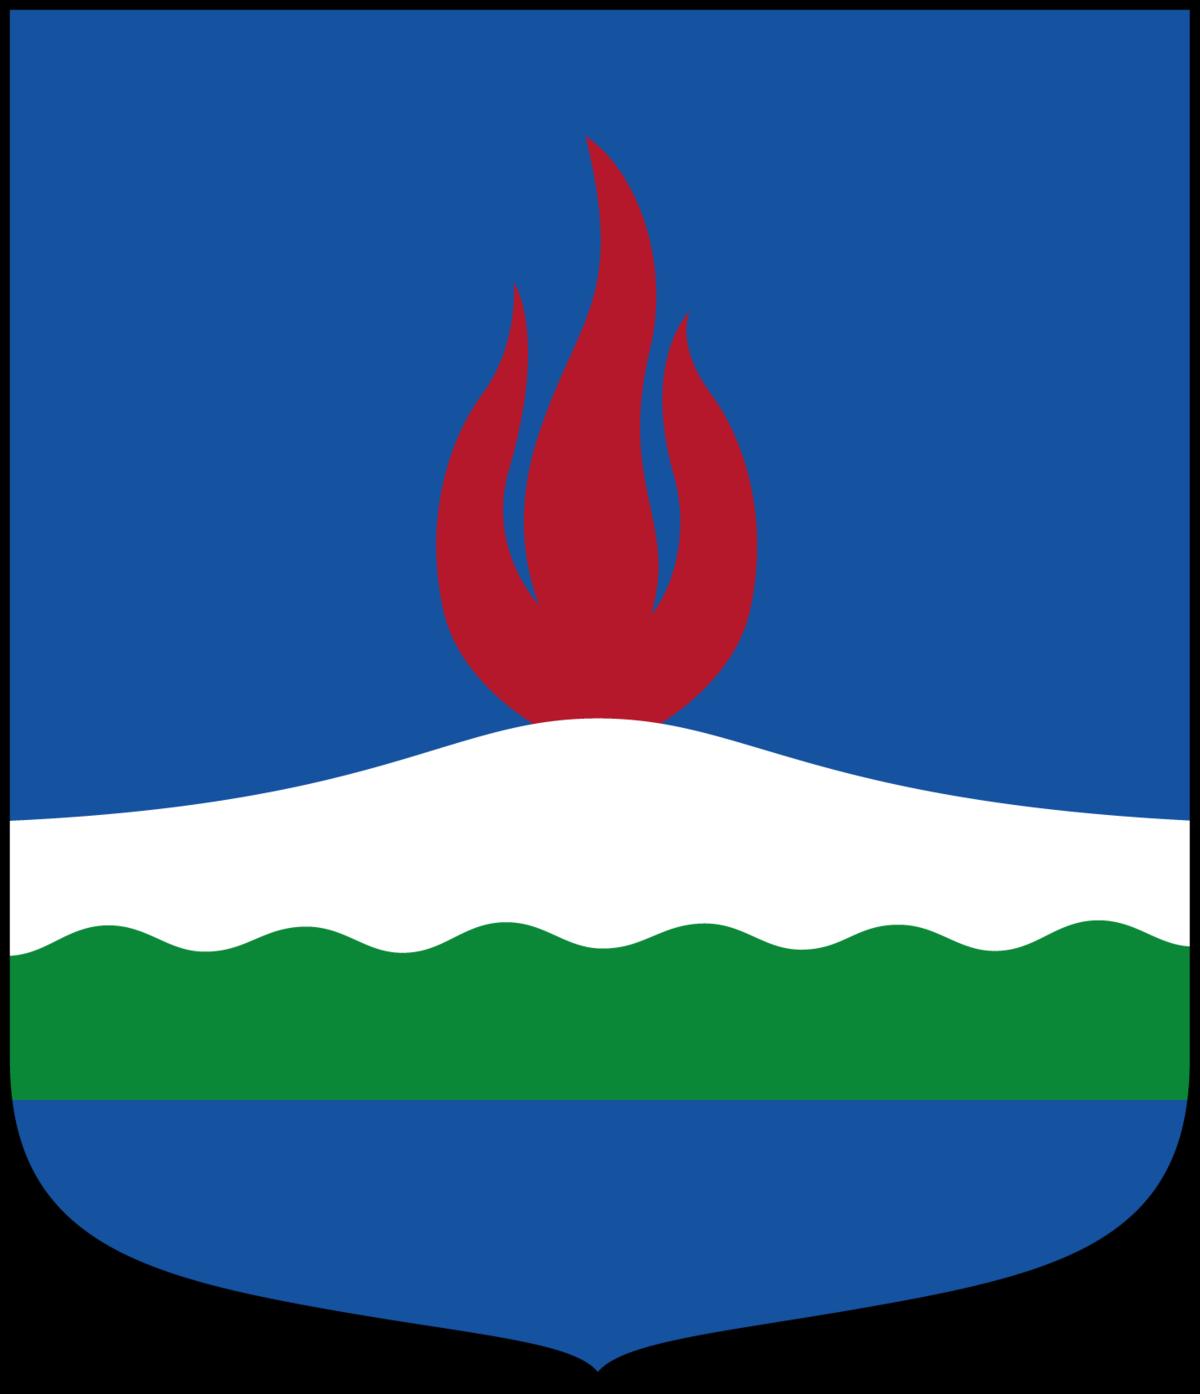 Dals-Ed Parish, lvsborg, Sweden Genealogy - FamilySearch